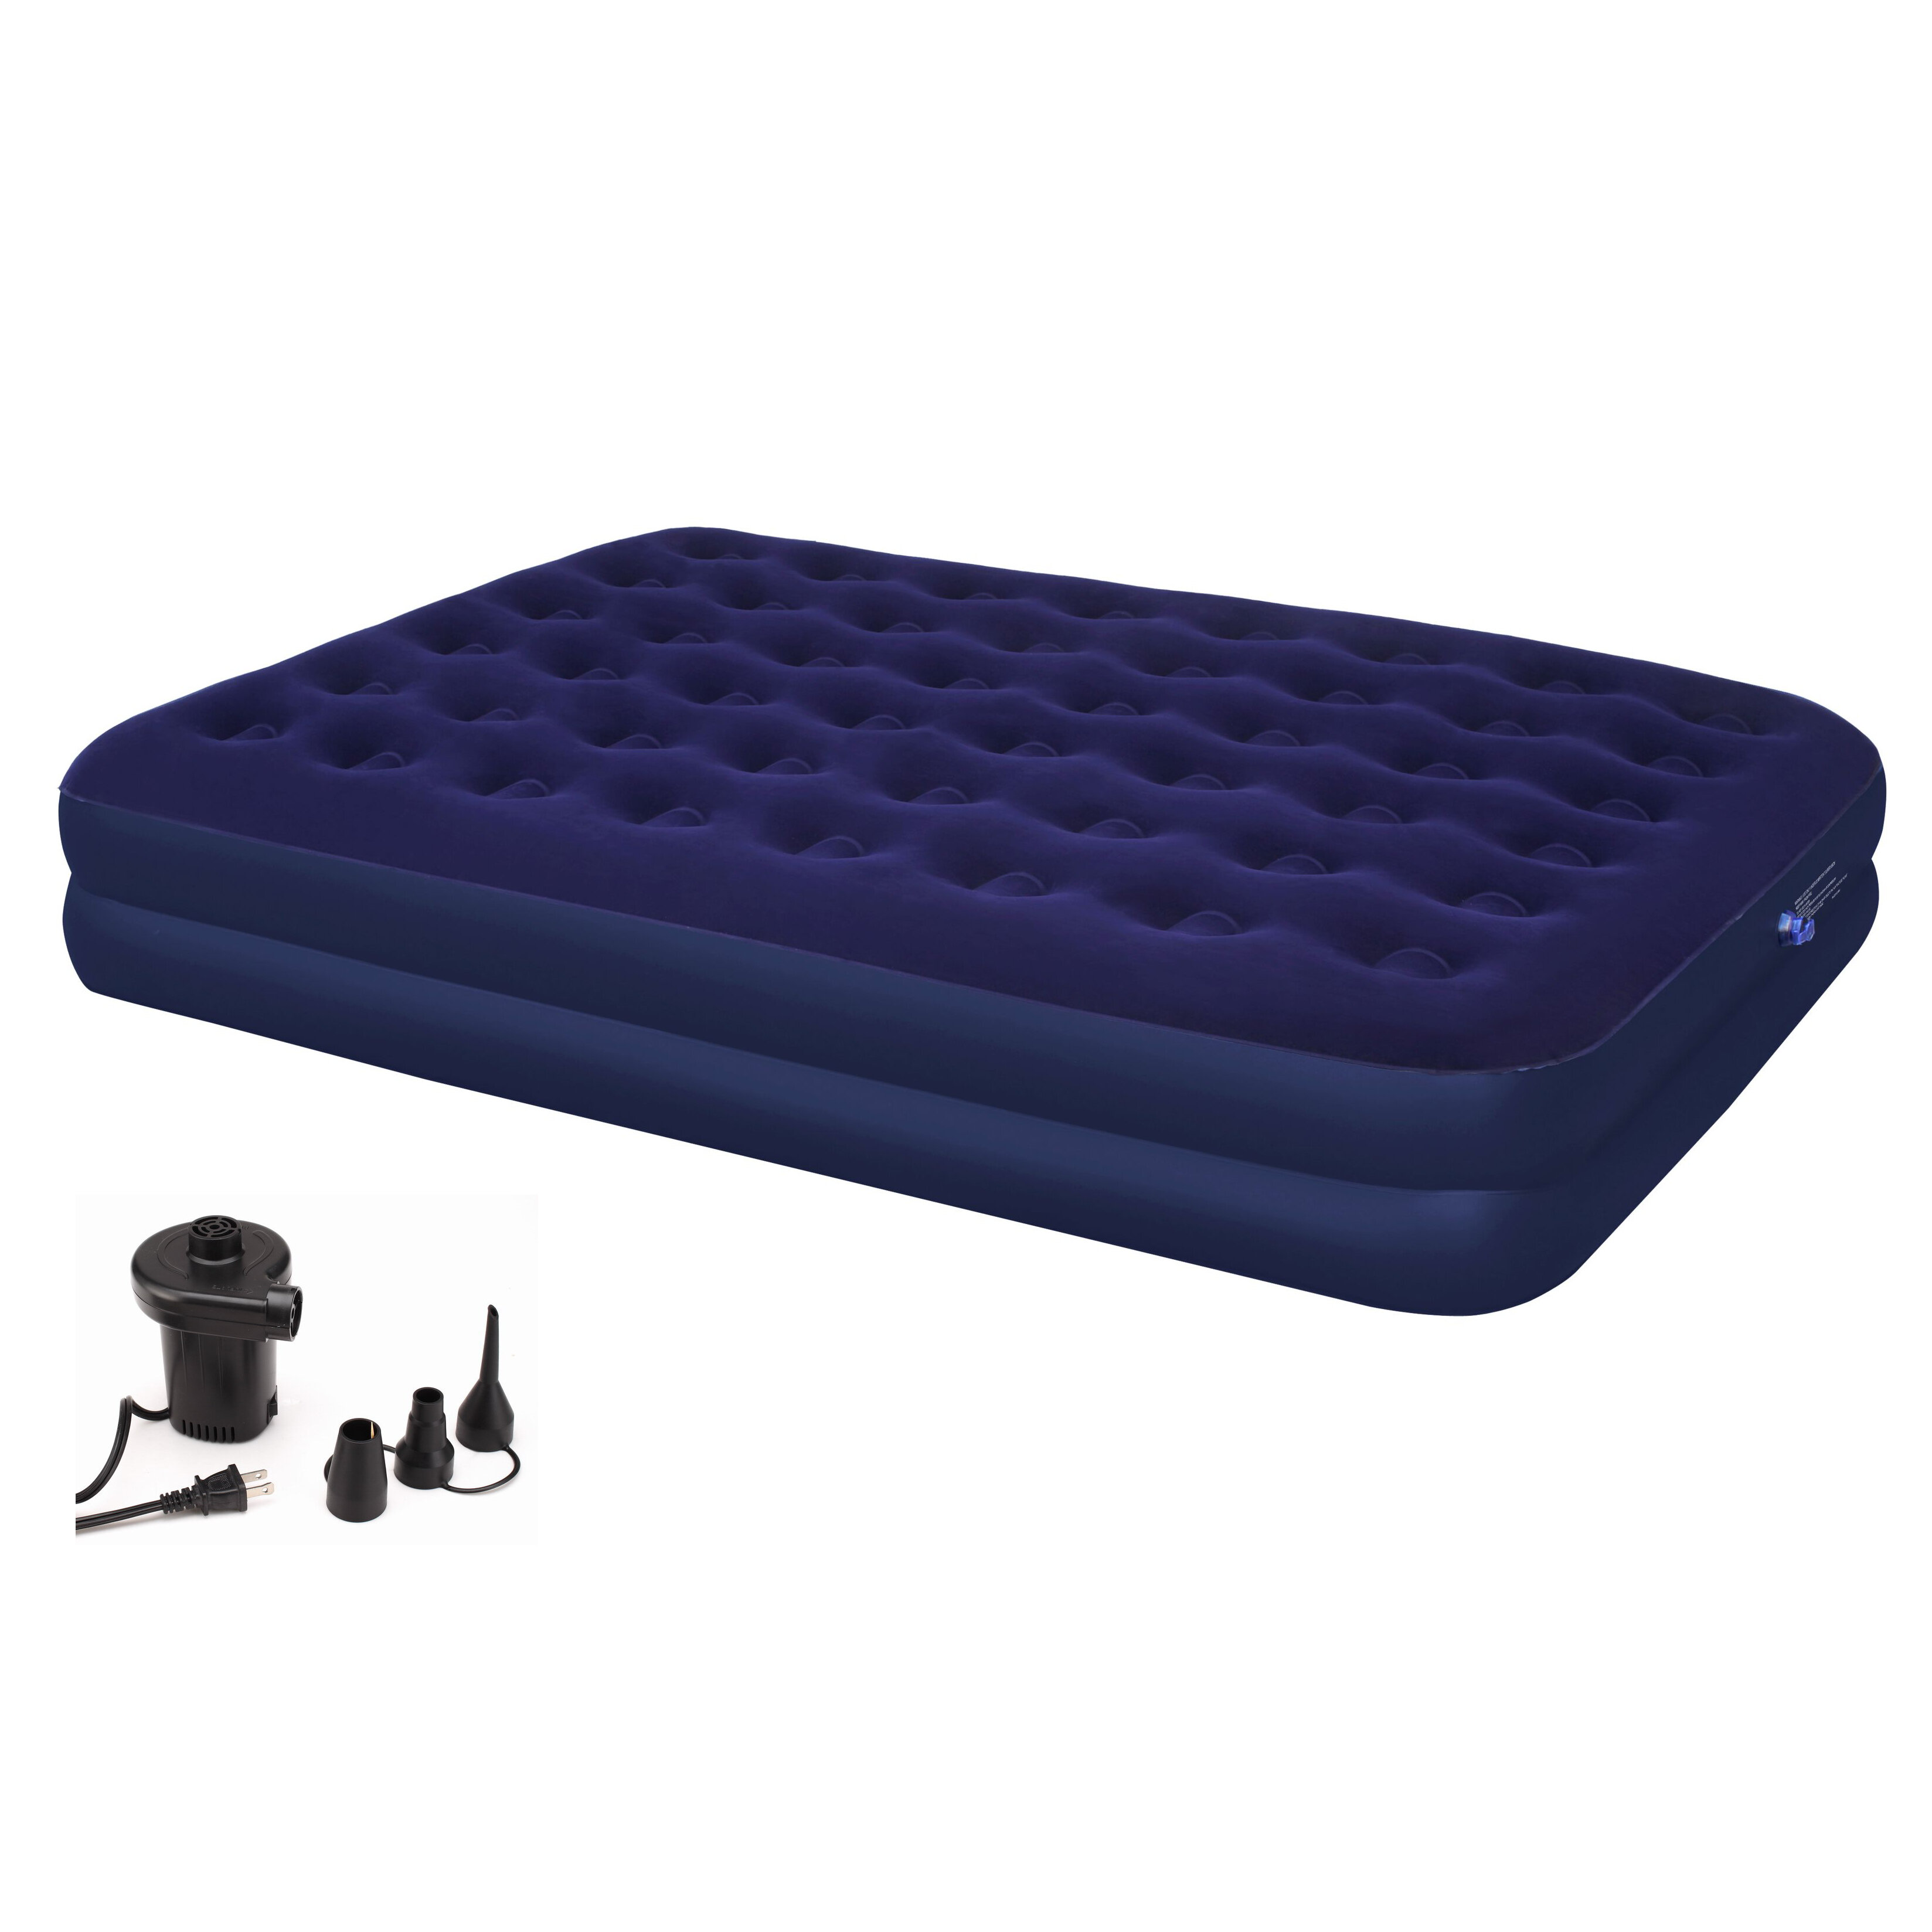 foam review l reviews spring air memory mattress